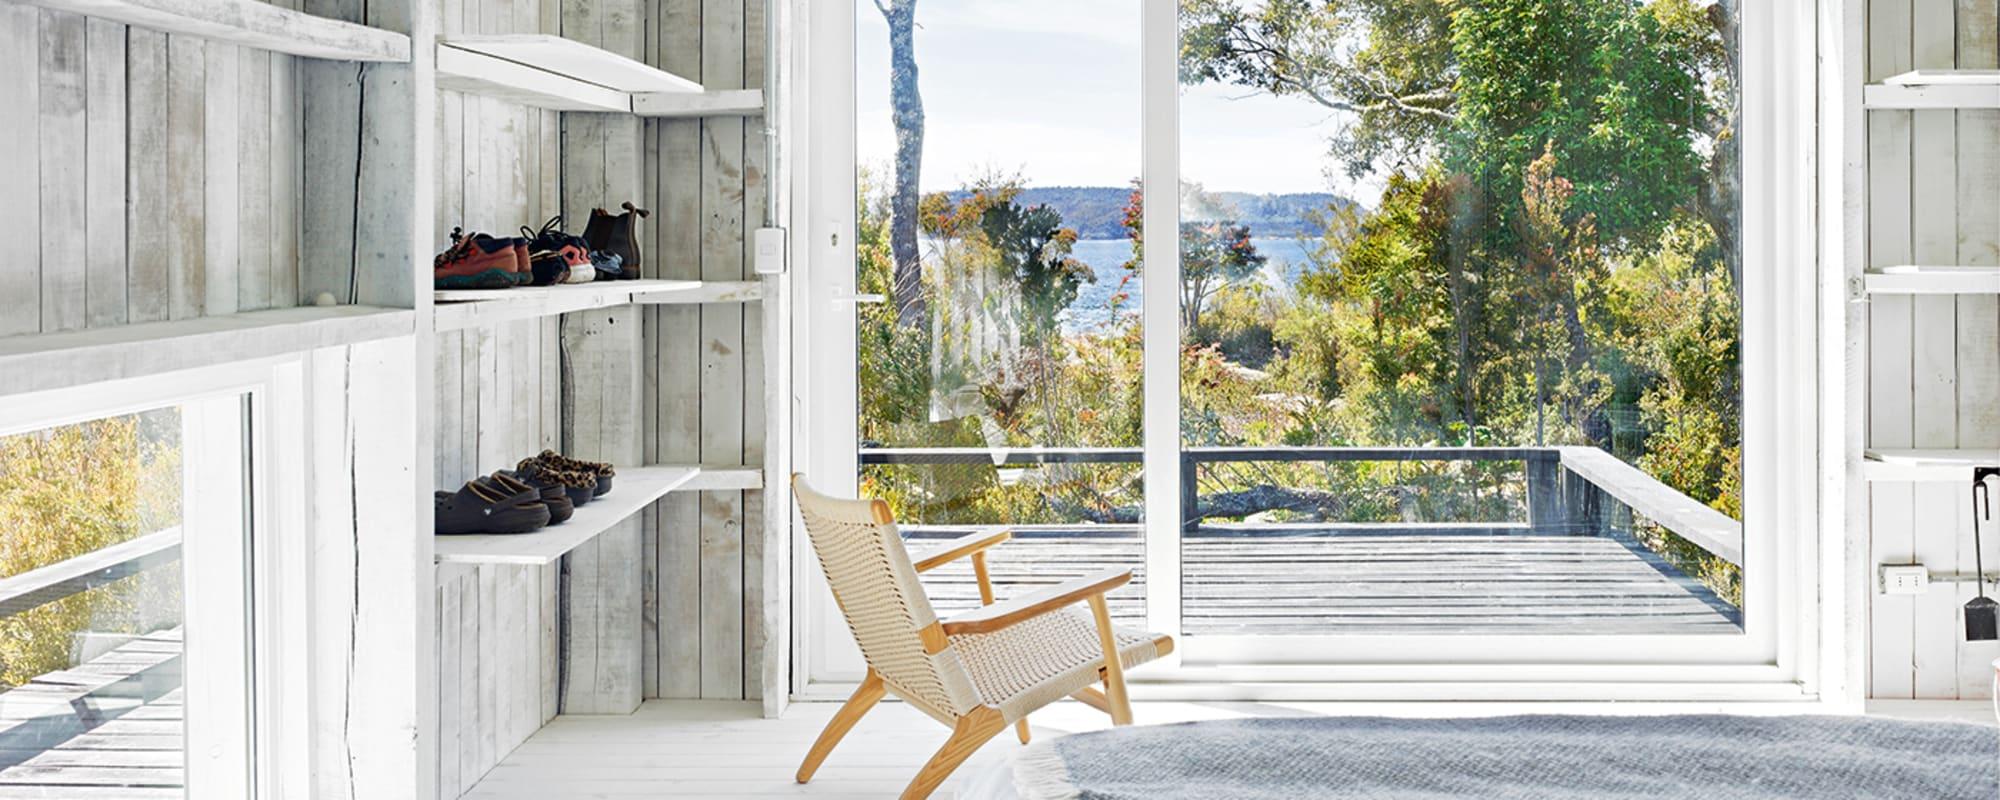 Mathias Klotz, Isla Coldita, Haus, Architektur